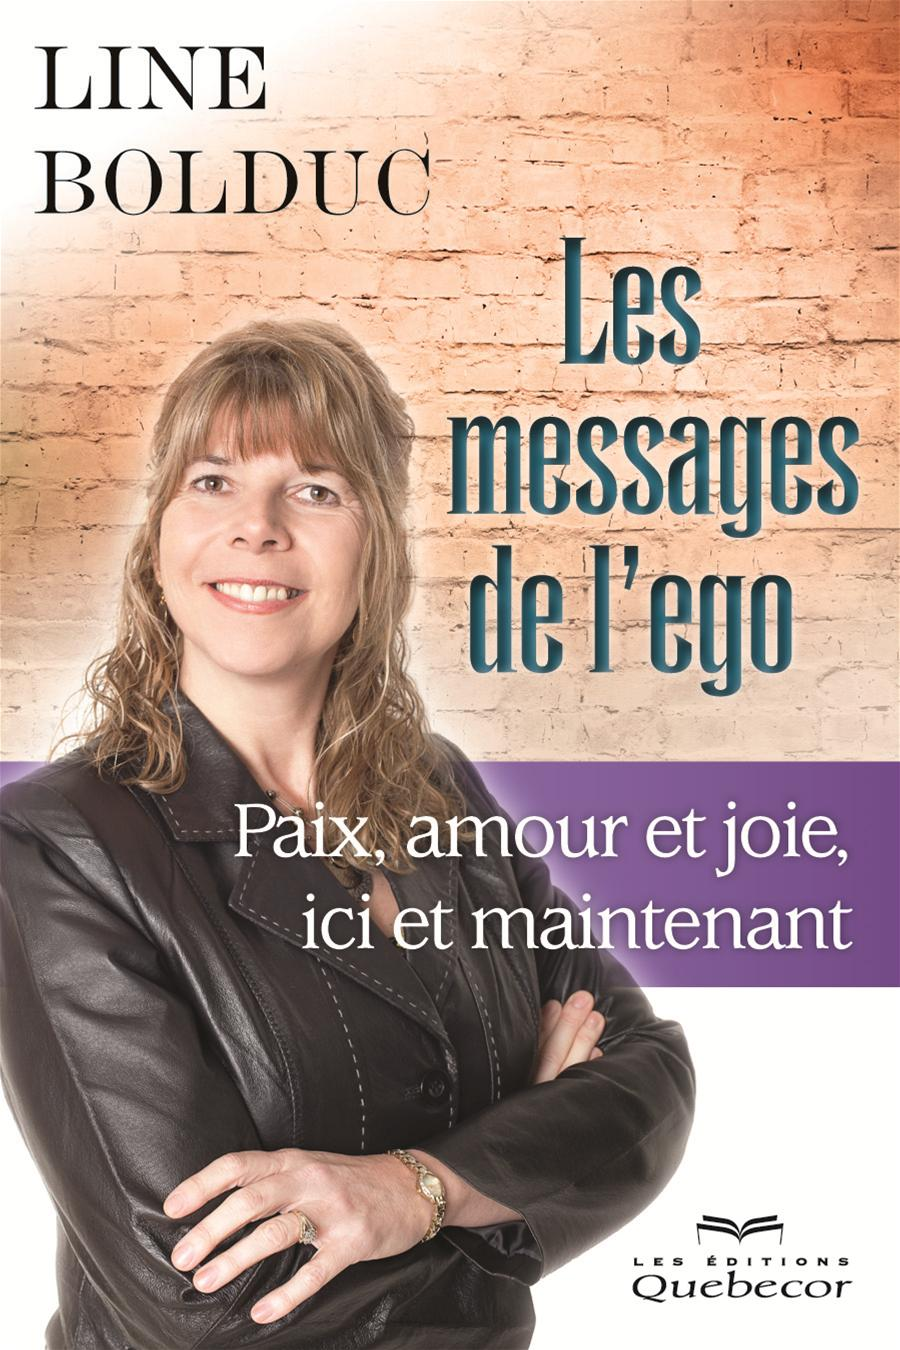 Les messages de l'ego